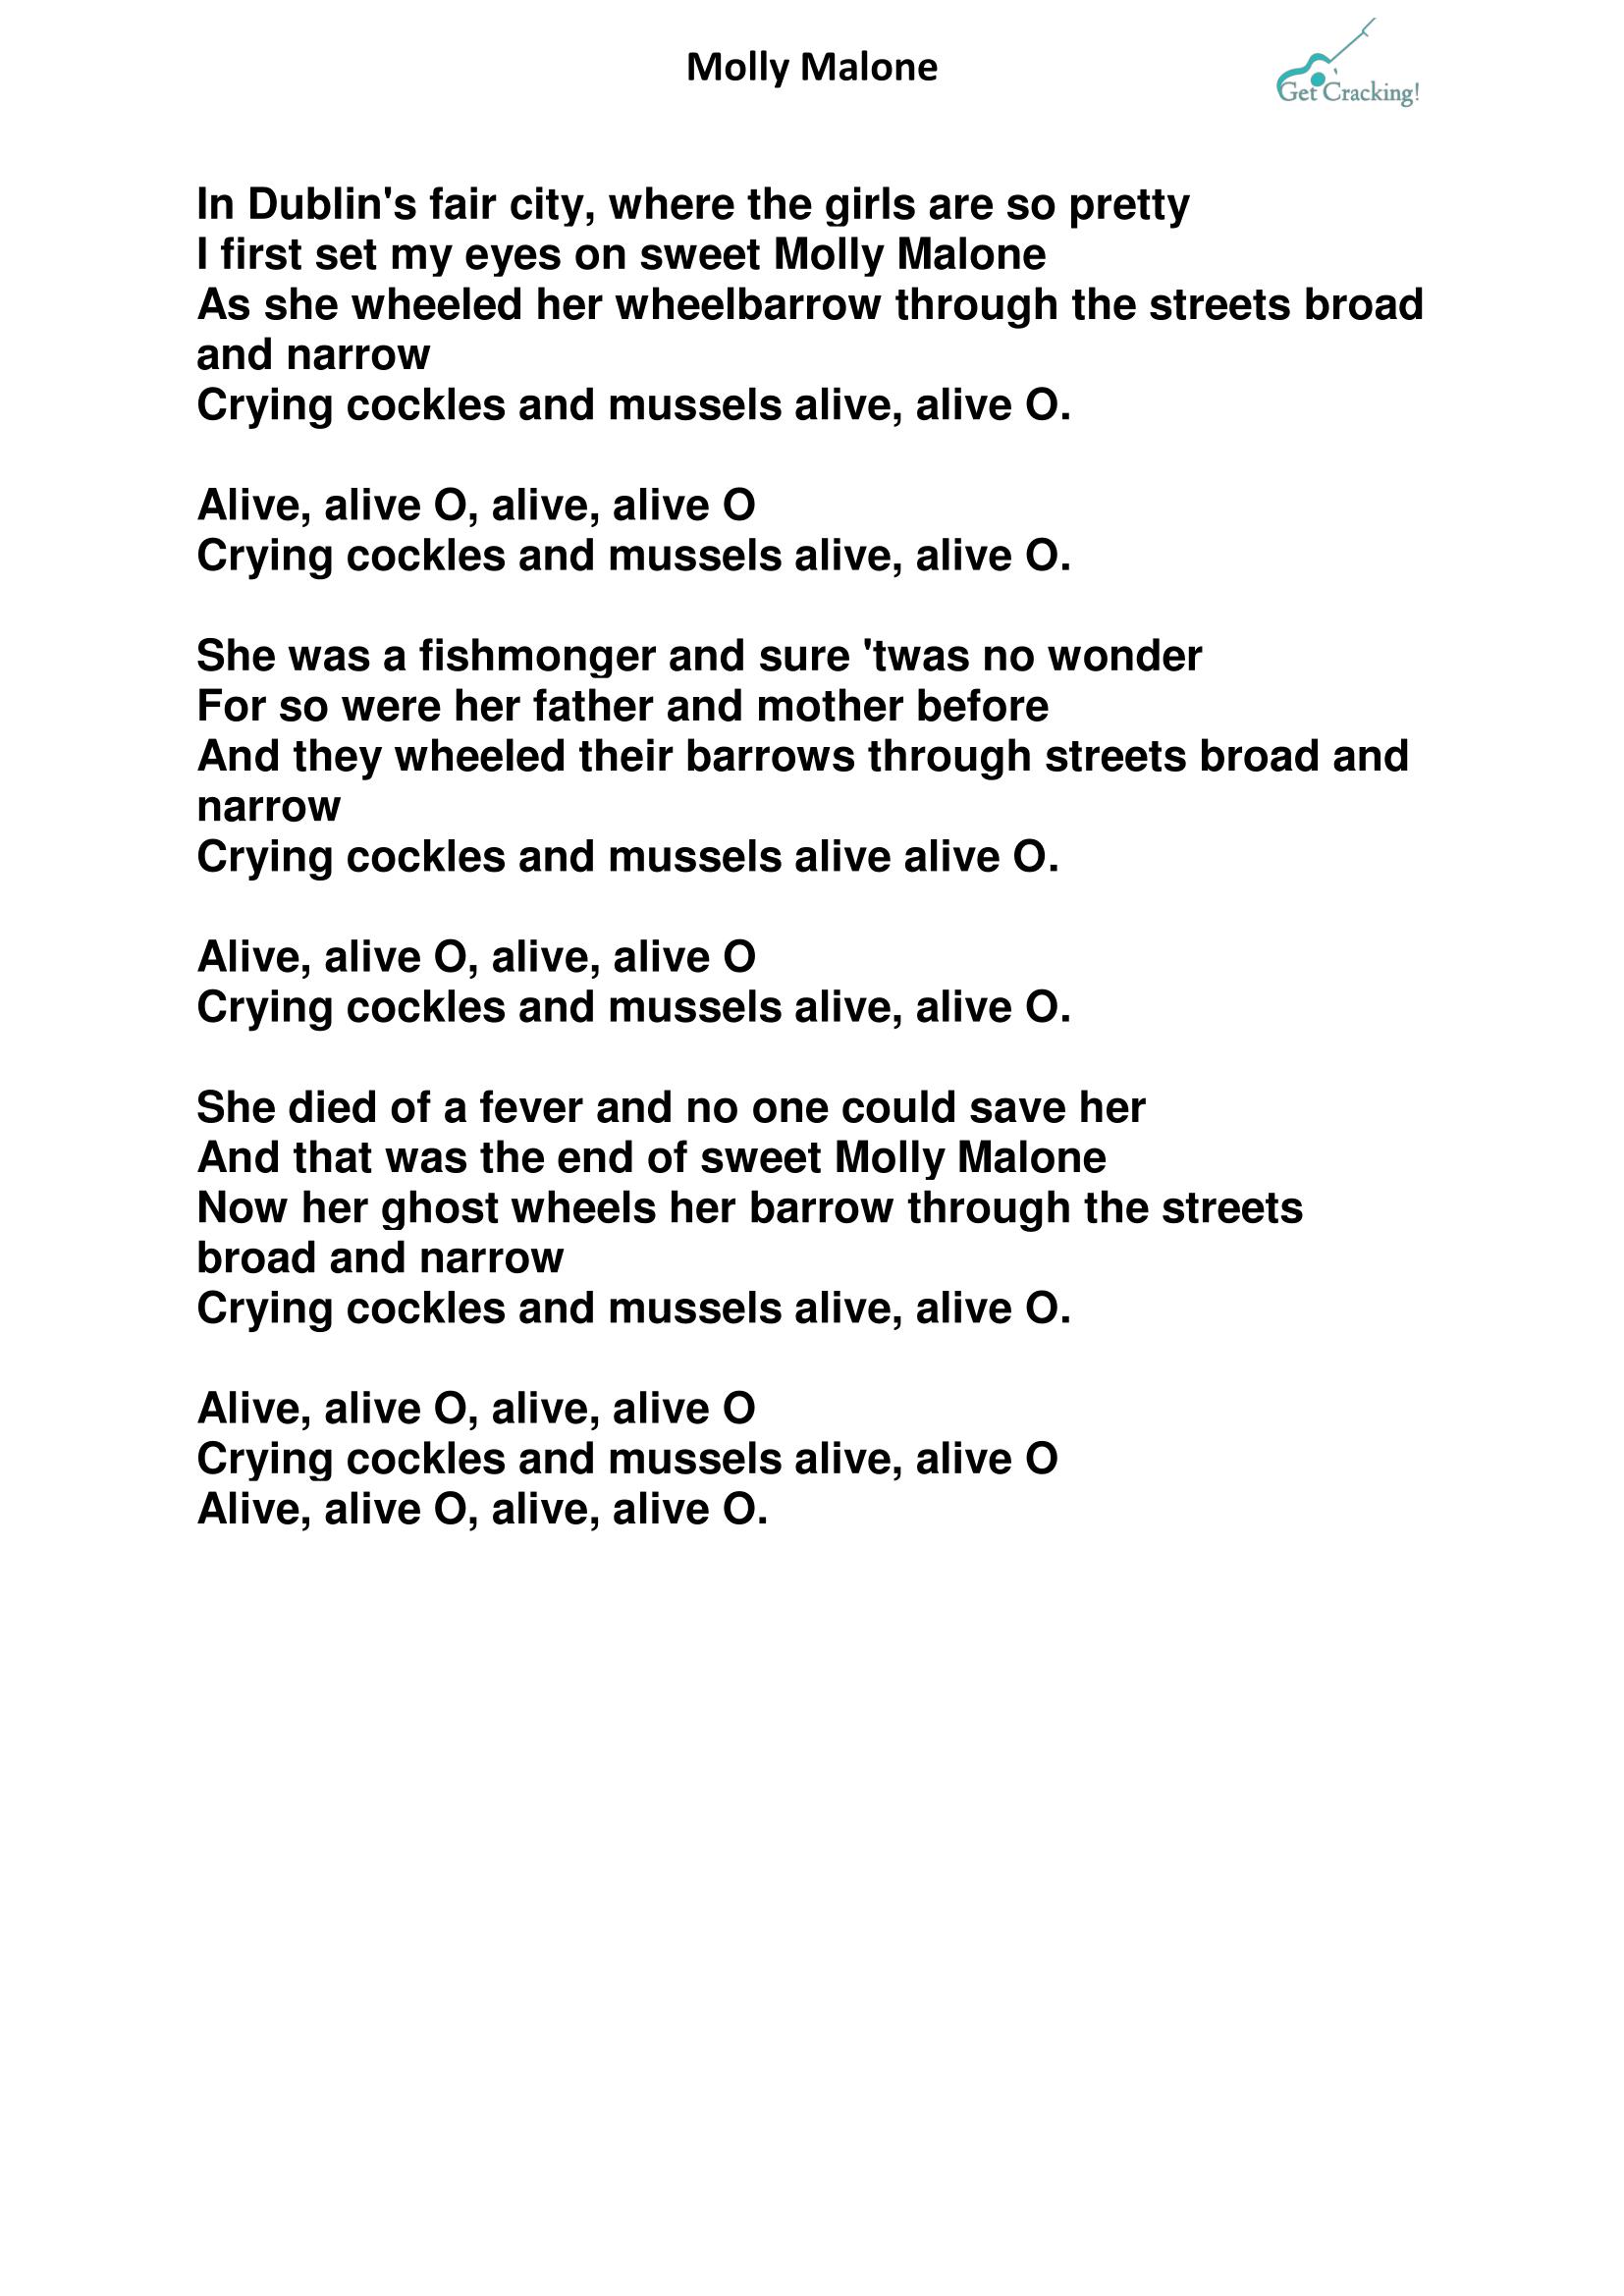 Molly Malone lyrics-1